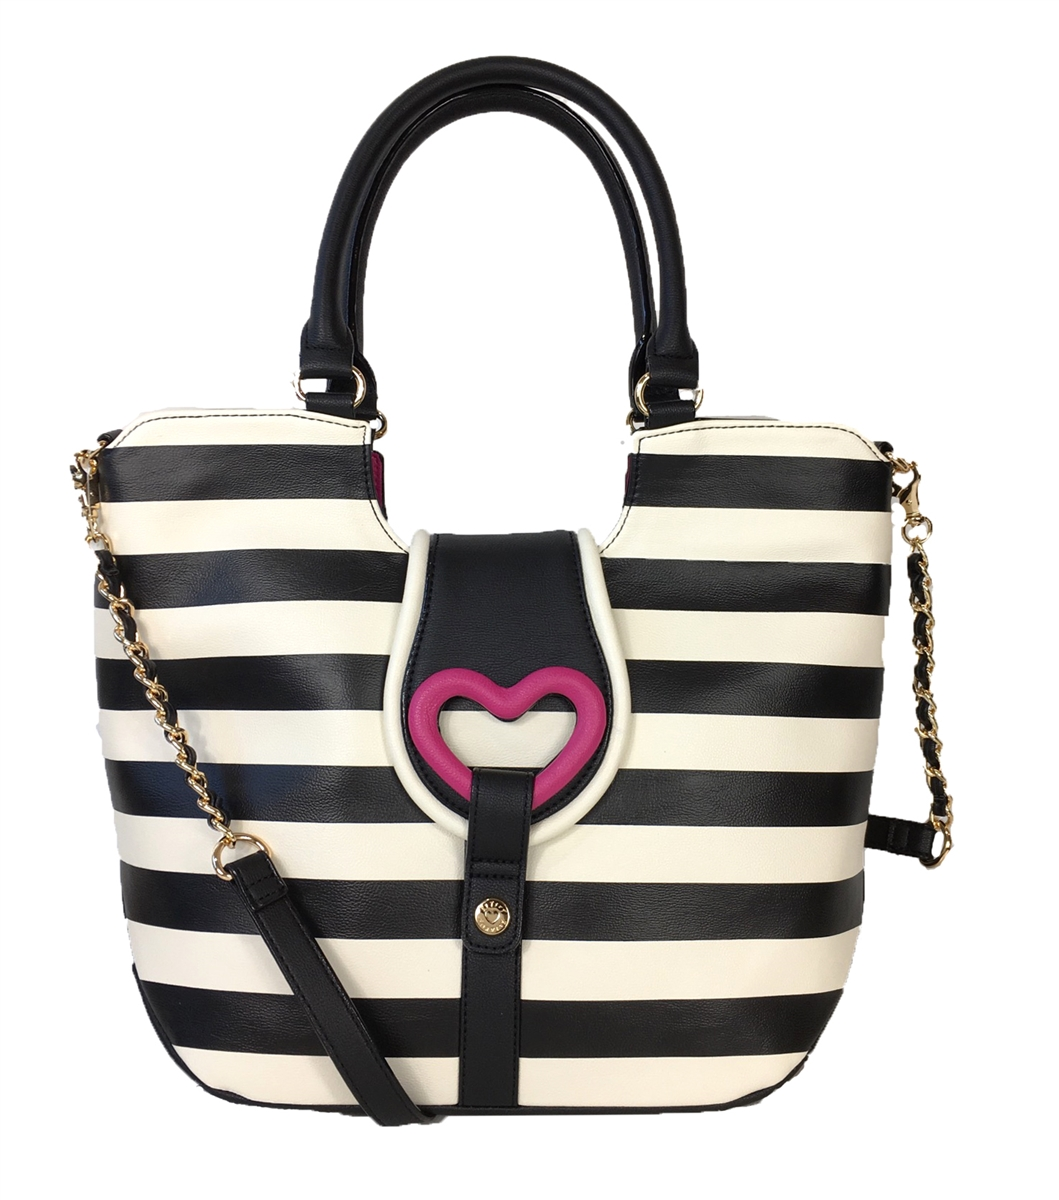 crossbody bag Betsey Johnson Black /& white stripe convertible clutch wallet